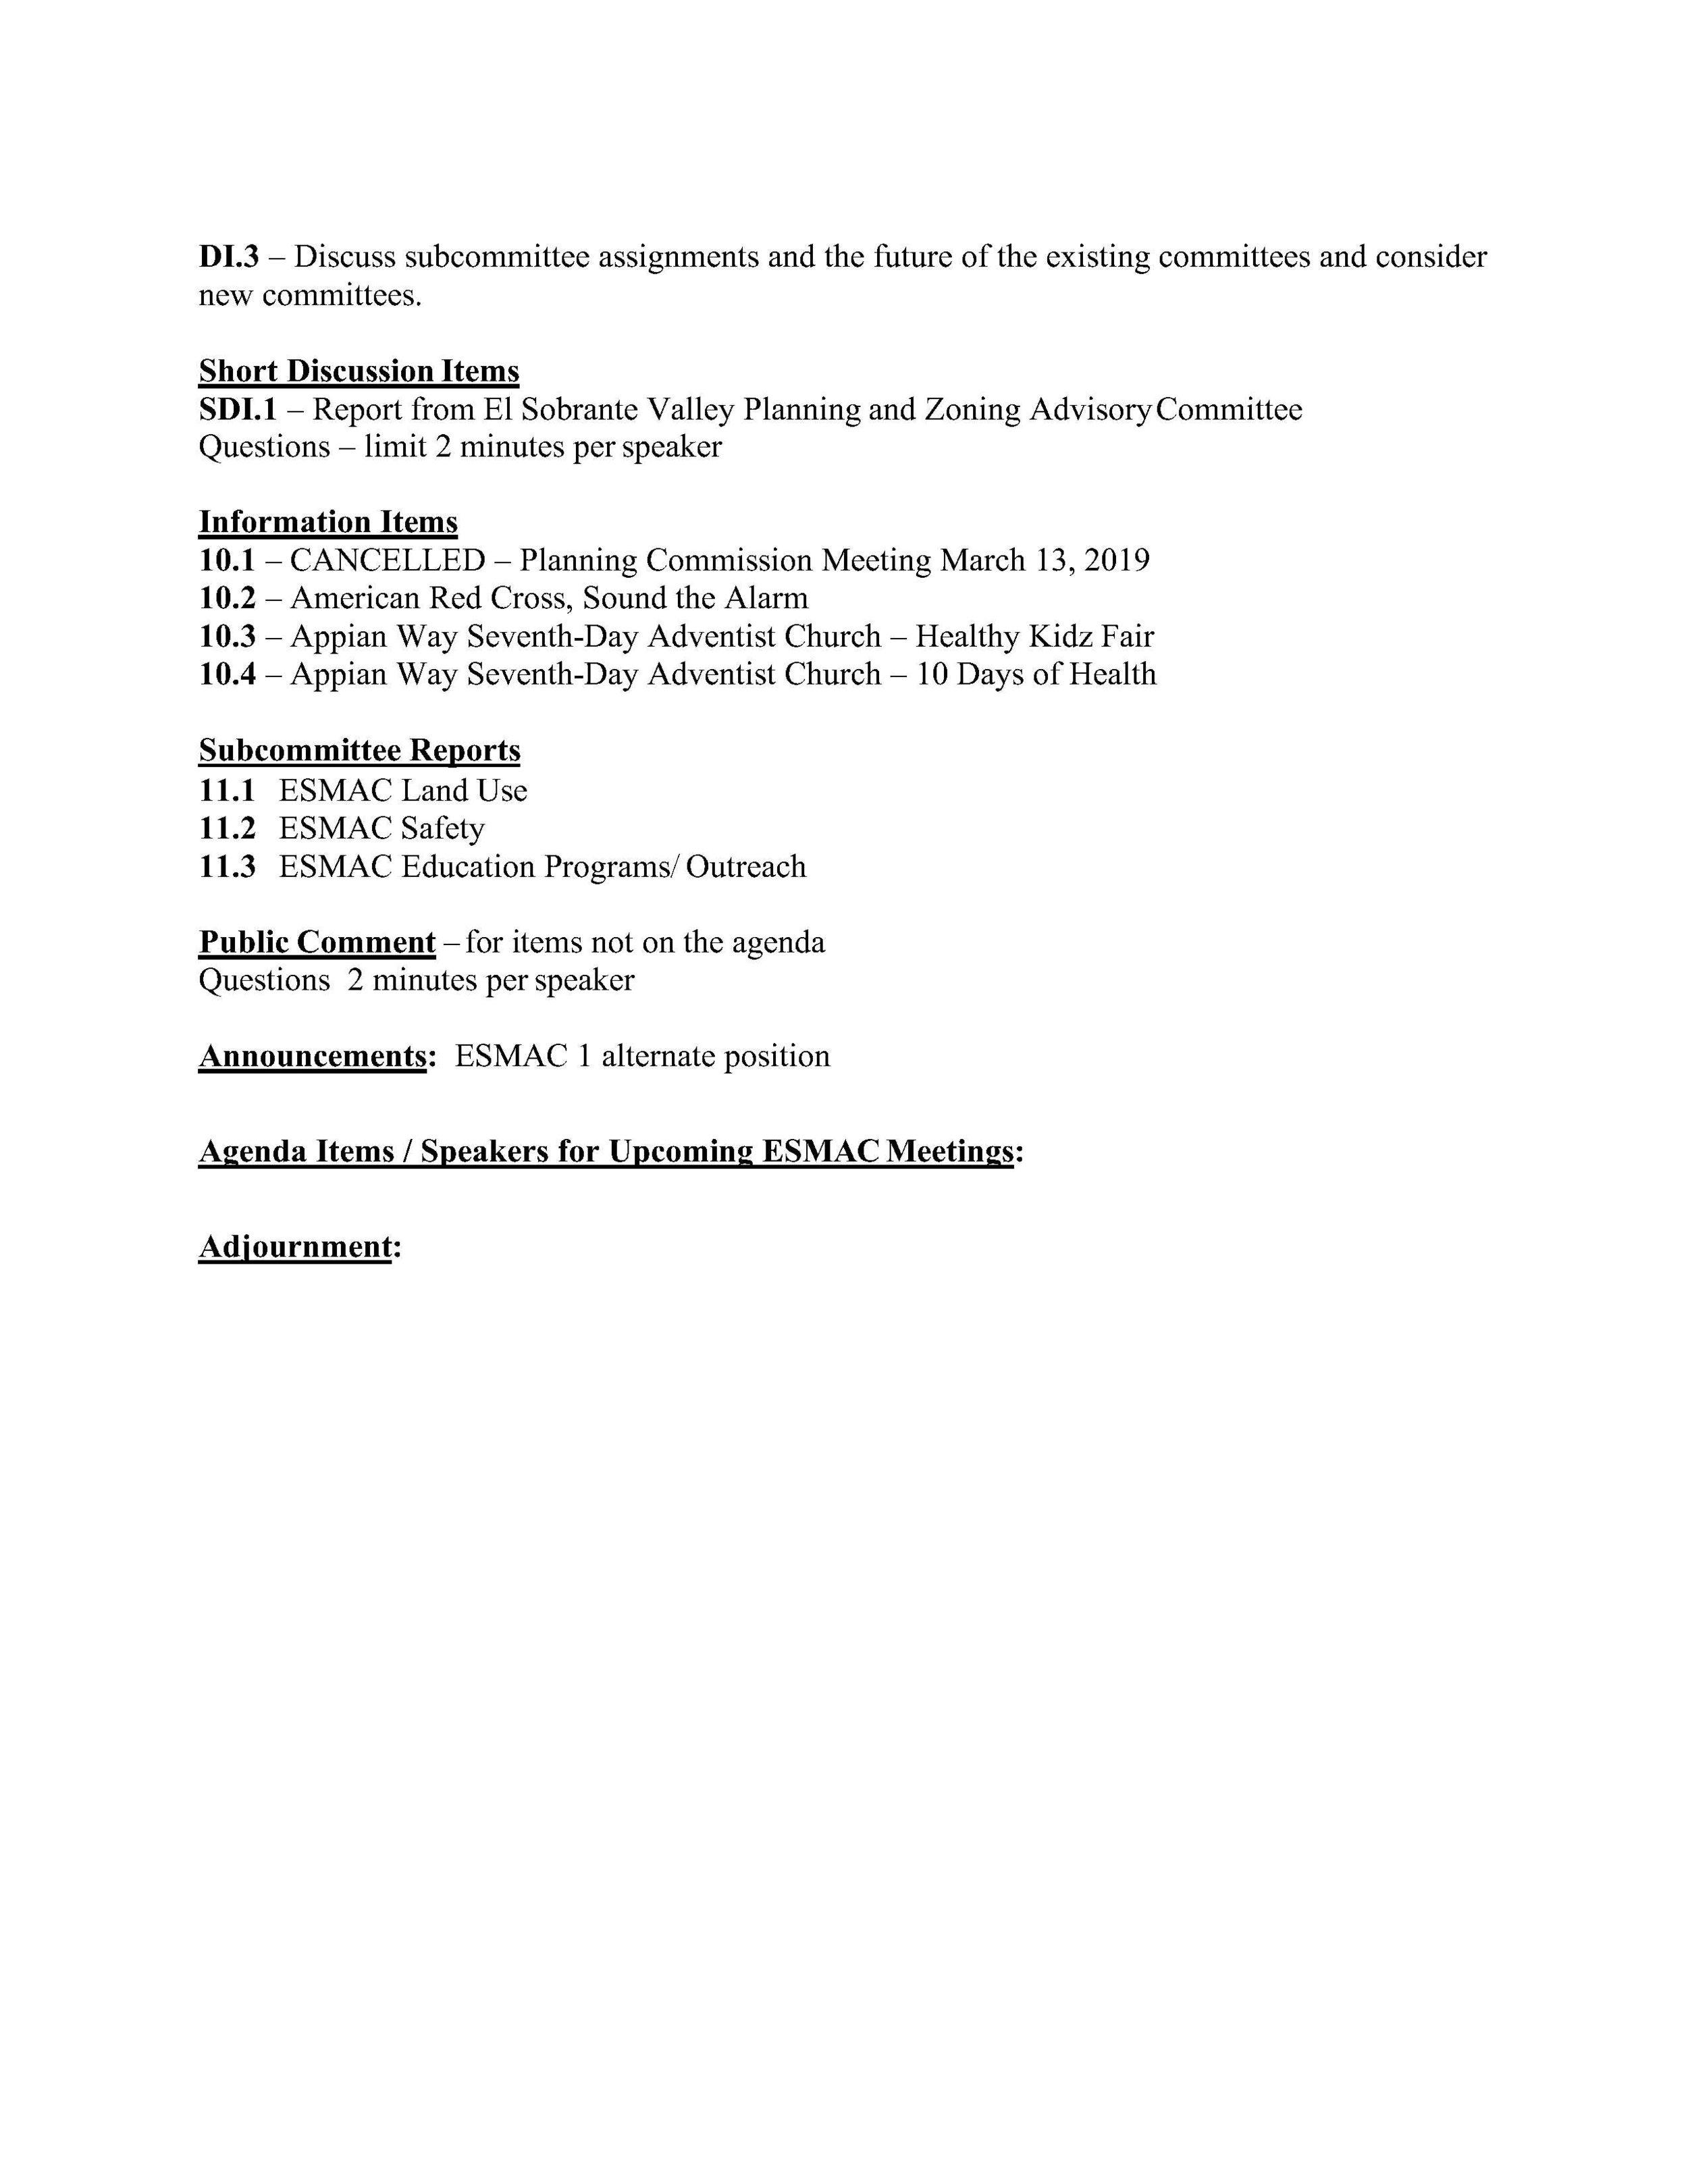 ESMAC Agenda 3.13.2019 (8 Pages)_2.jpg